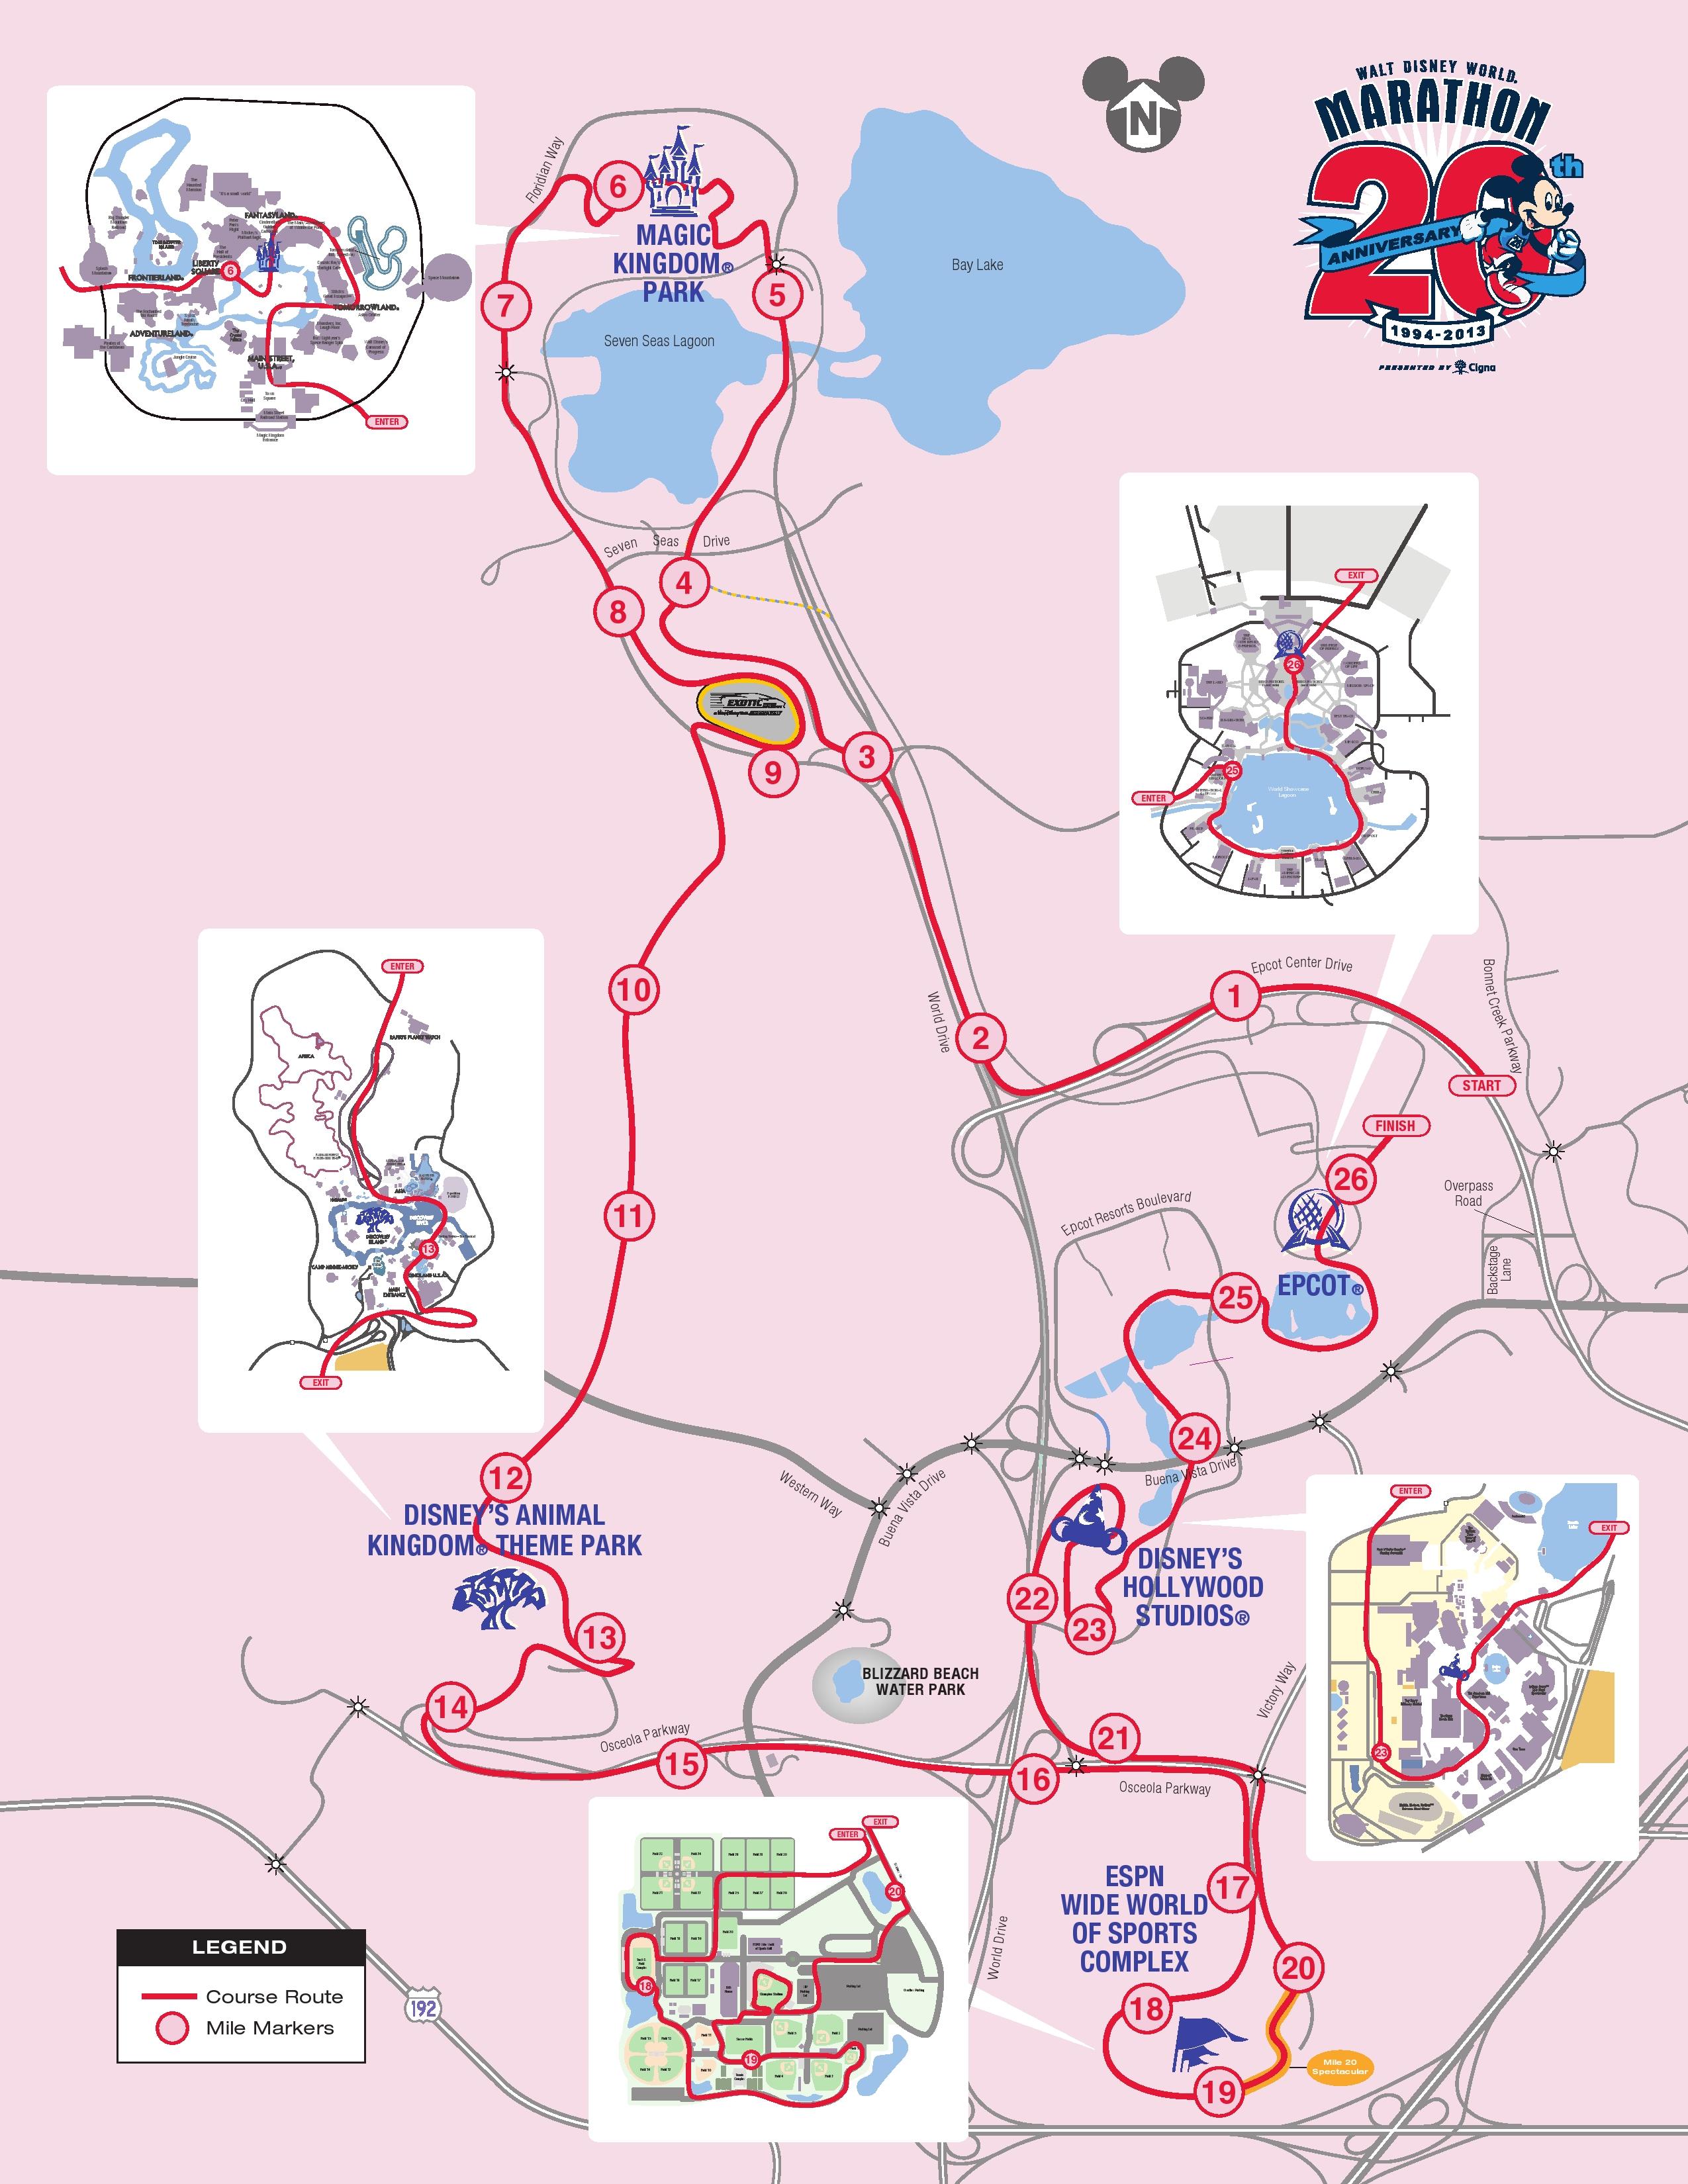 2013-wdw-marathon